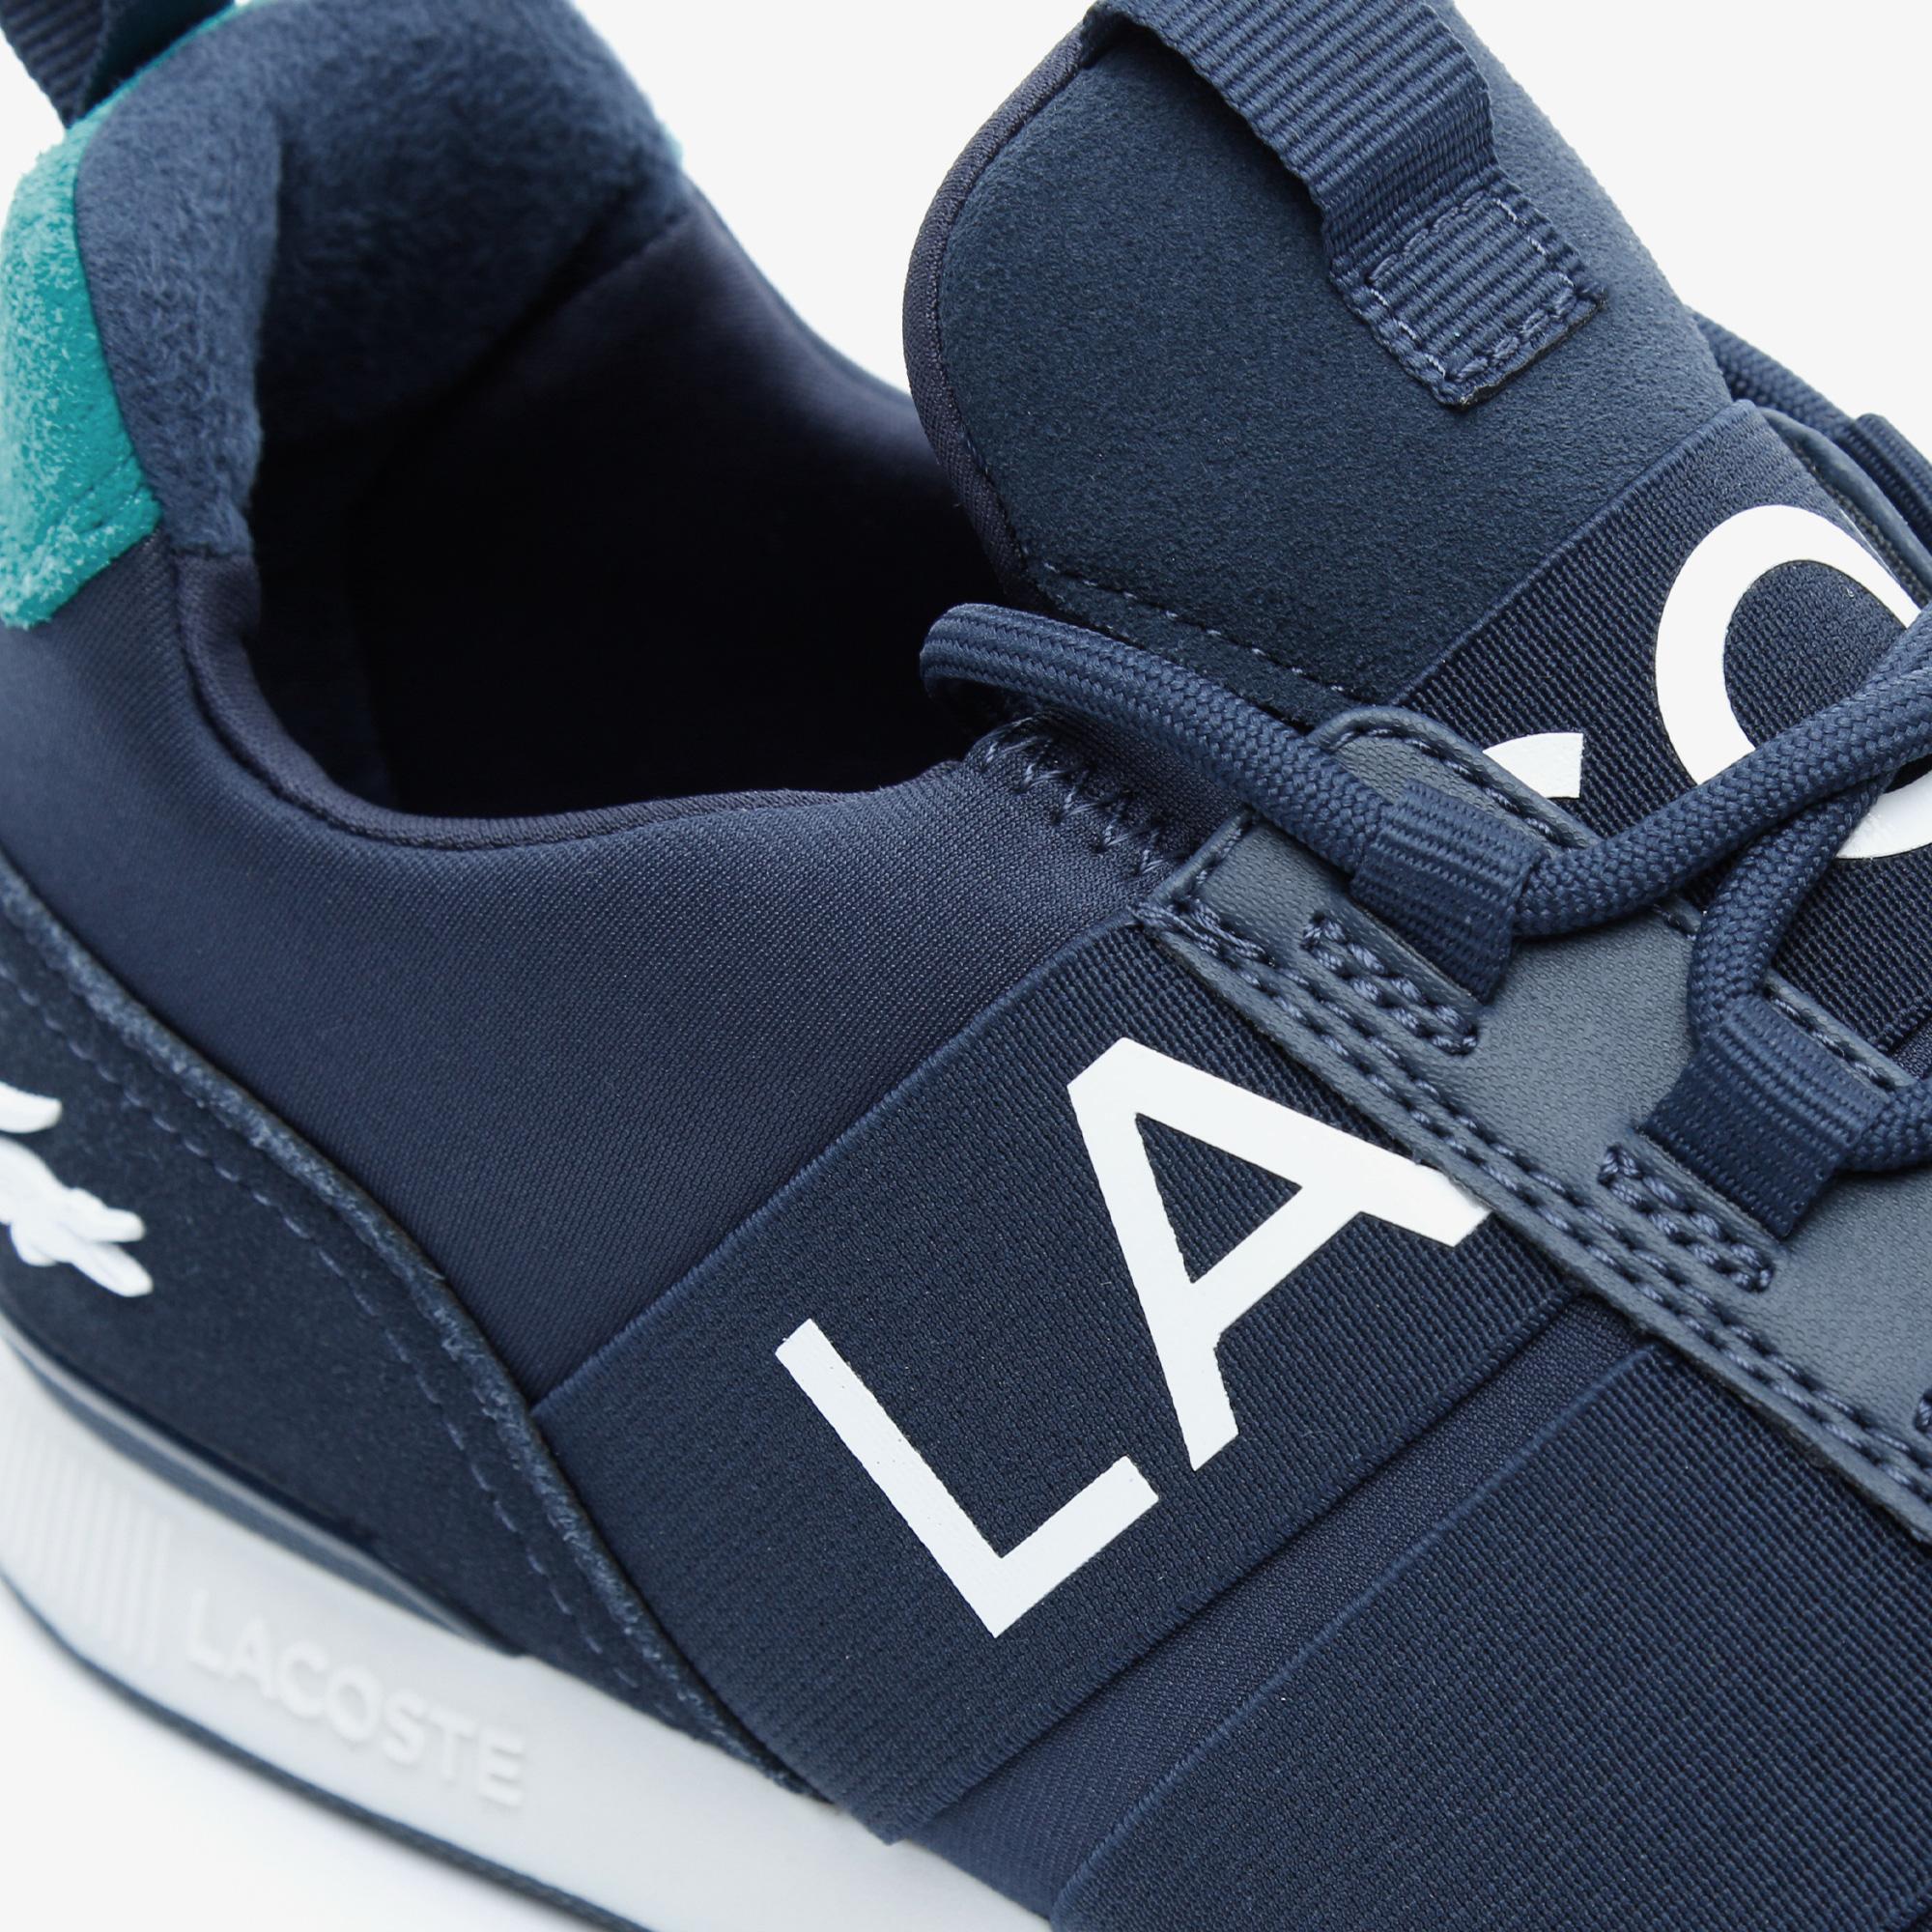 Lacoste Menerva Elite 0120 1 Cma Erkek Lacivert - Yeşil Sneaker